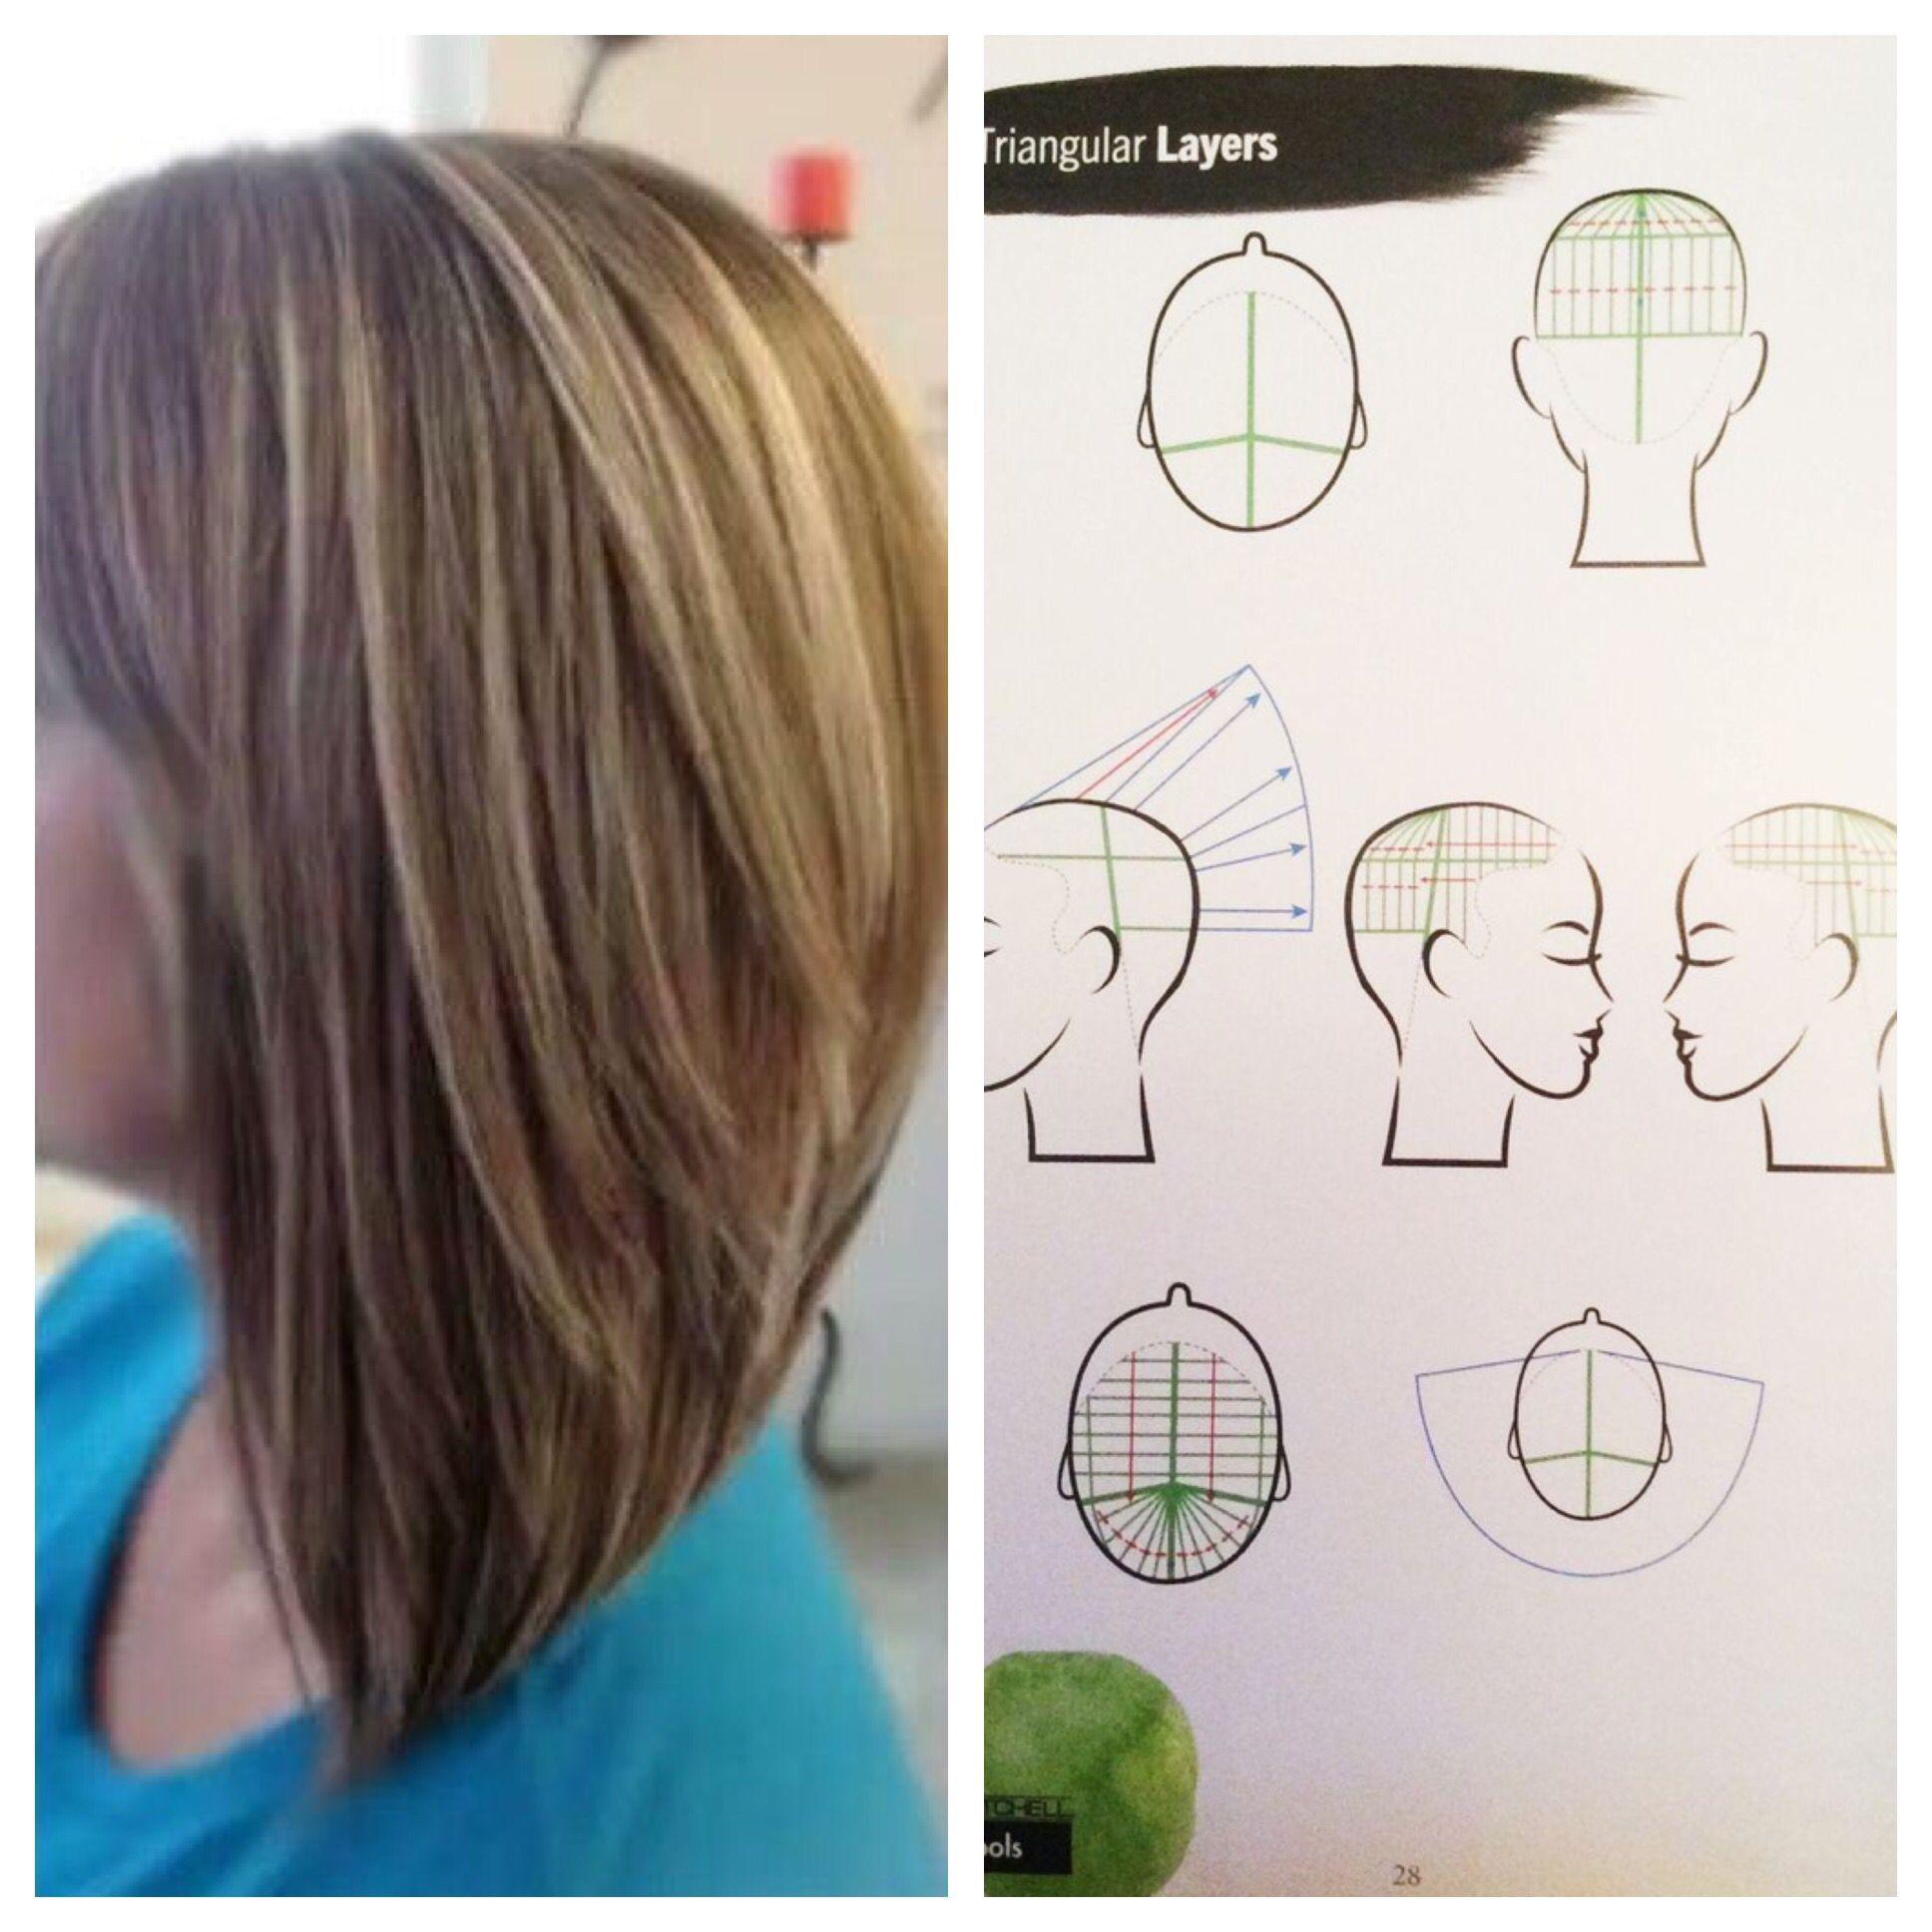 medium resolution of 180 degree haircut diagram how to tie a tie diagram wiring diagrams 180 degree haircut diagram how to tie a tie diagram